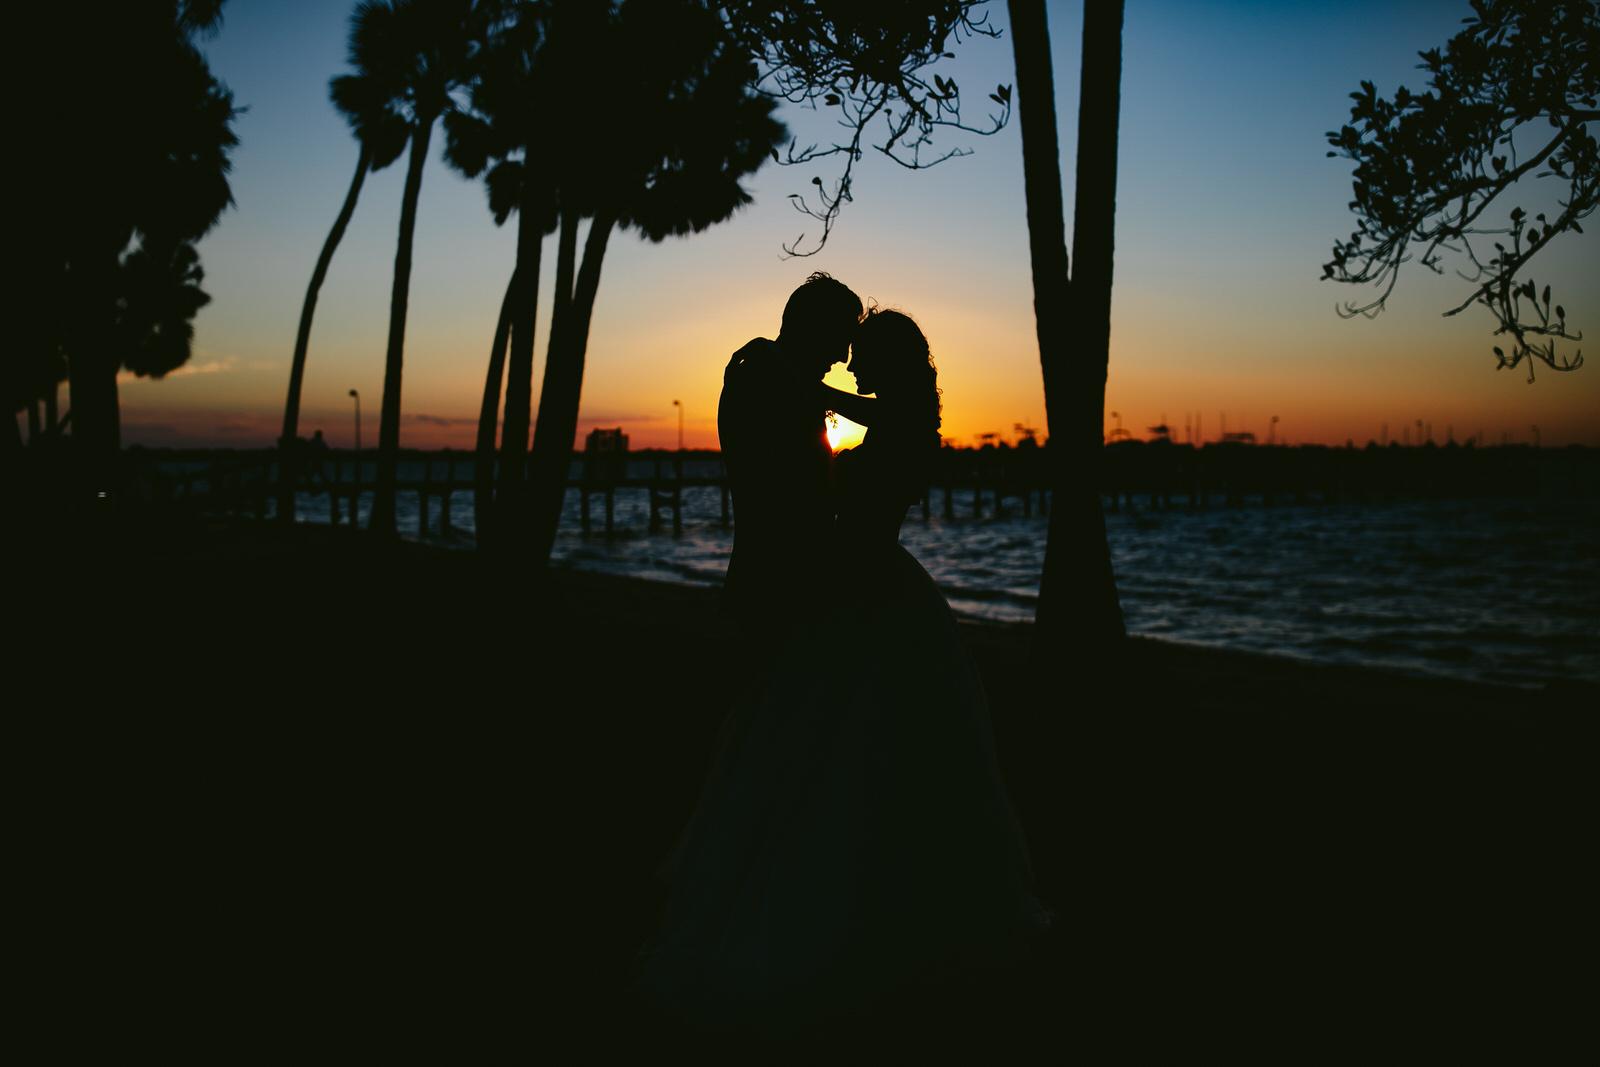 jensen_beach_wedding_tiny_house_photo_sneak_peeks-14.jpg